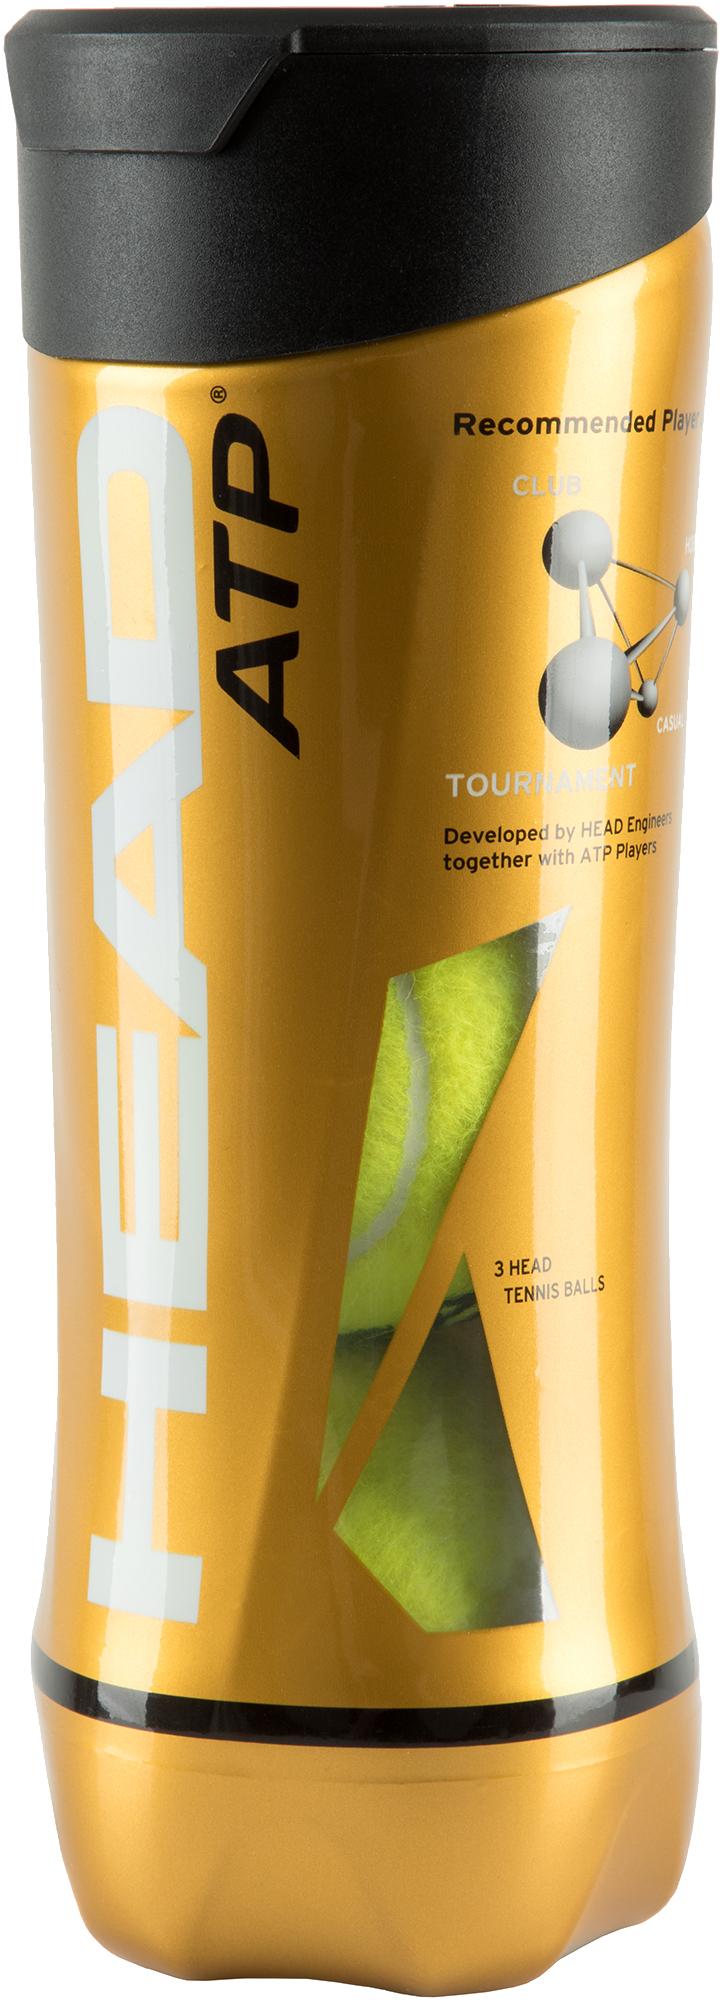 Head Набор теннисных мячей Head Atp, 3 шт цена